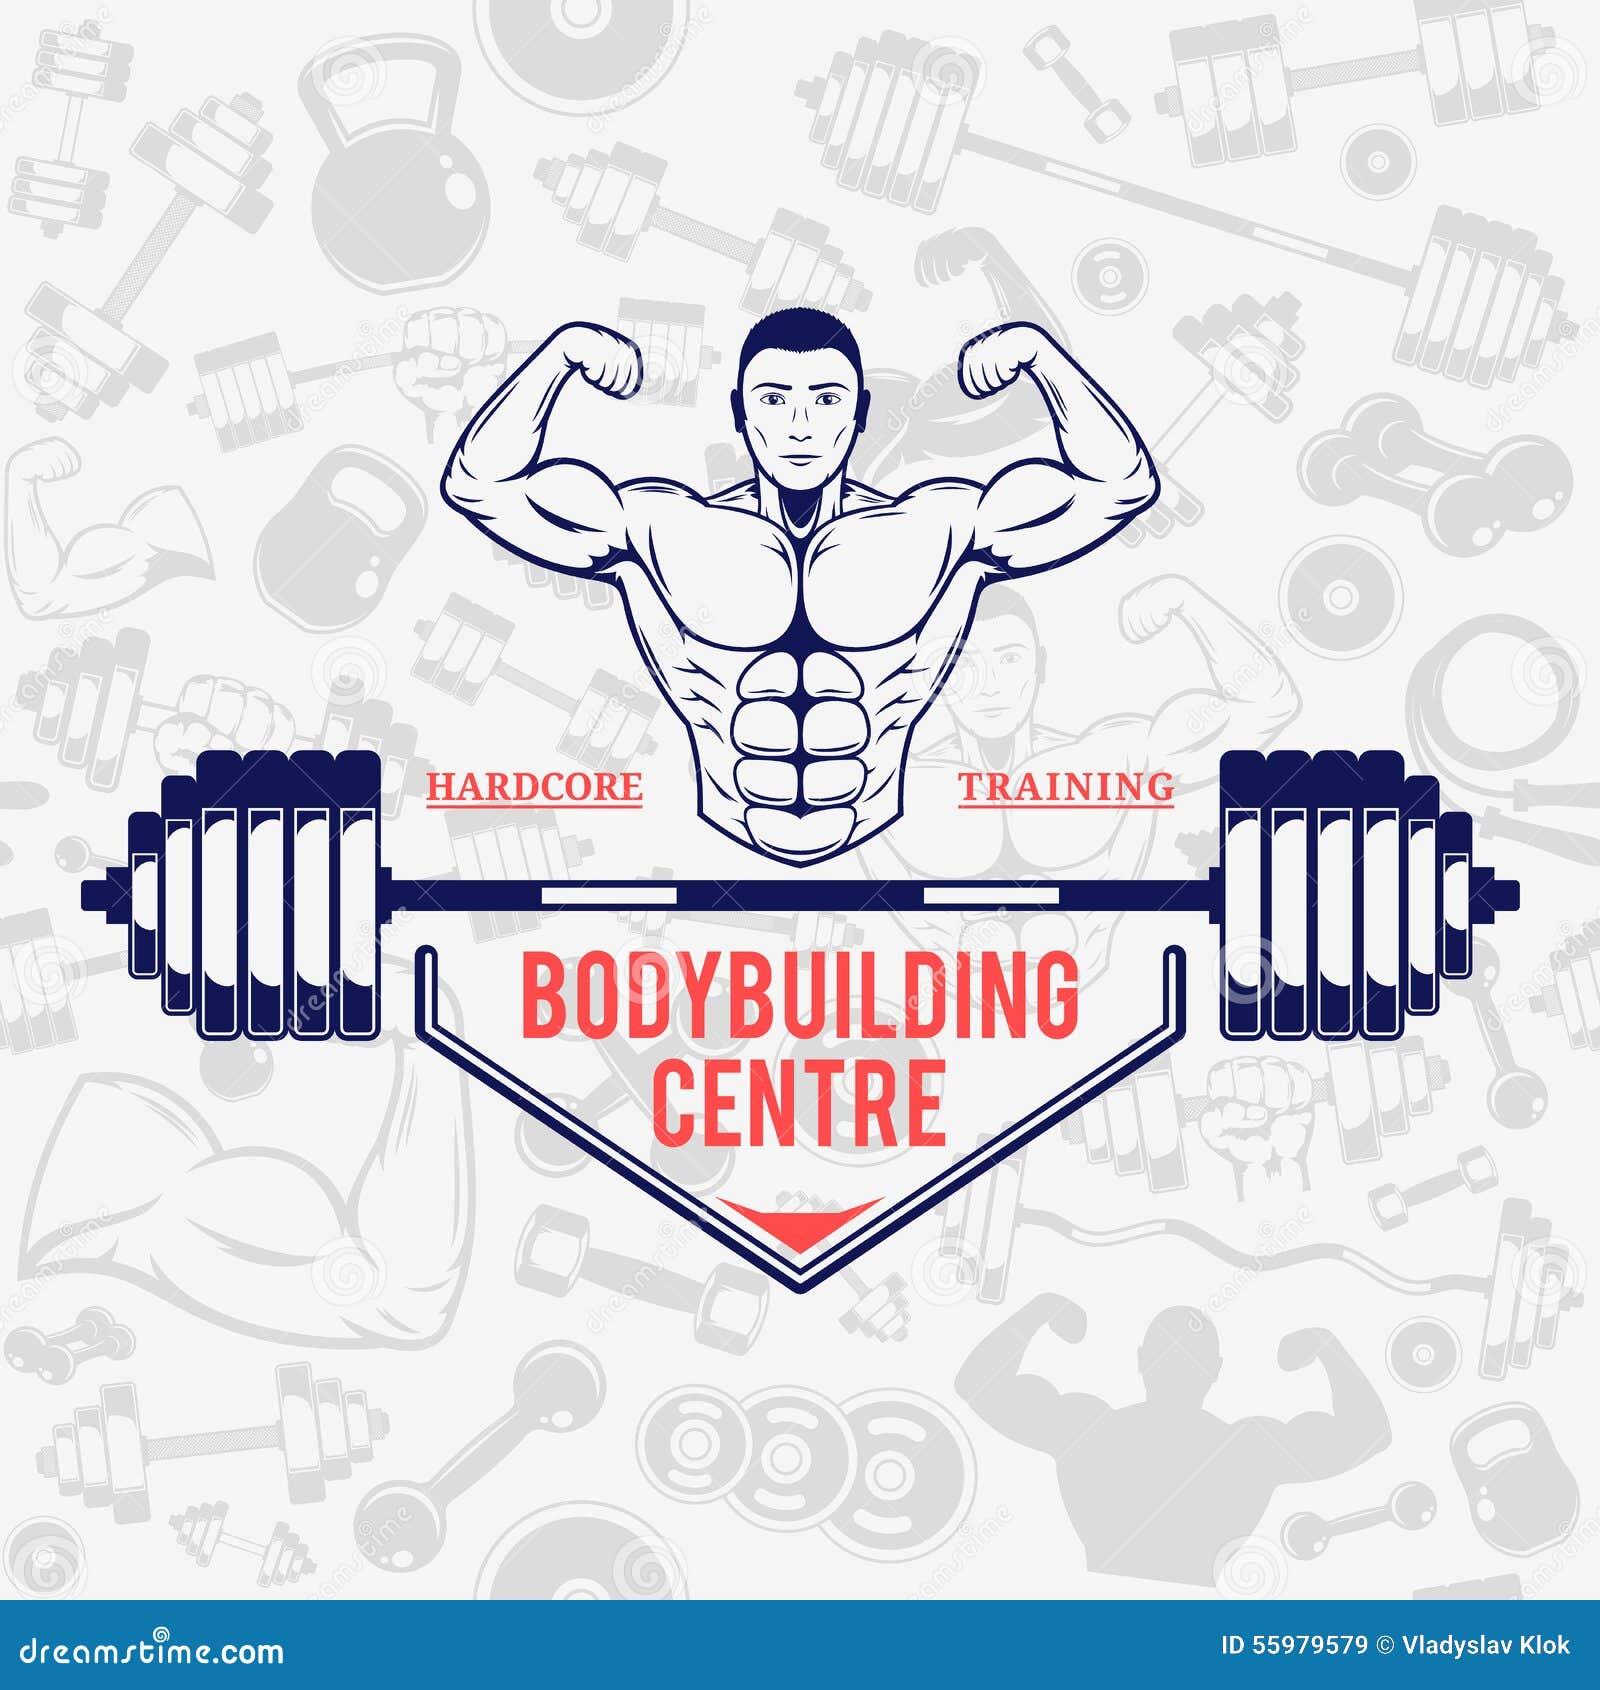 Gym Equipment Logo: Fitness Gym Logo Template Over Fitness Icons Seamless